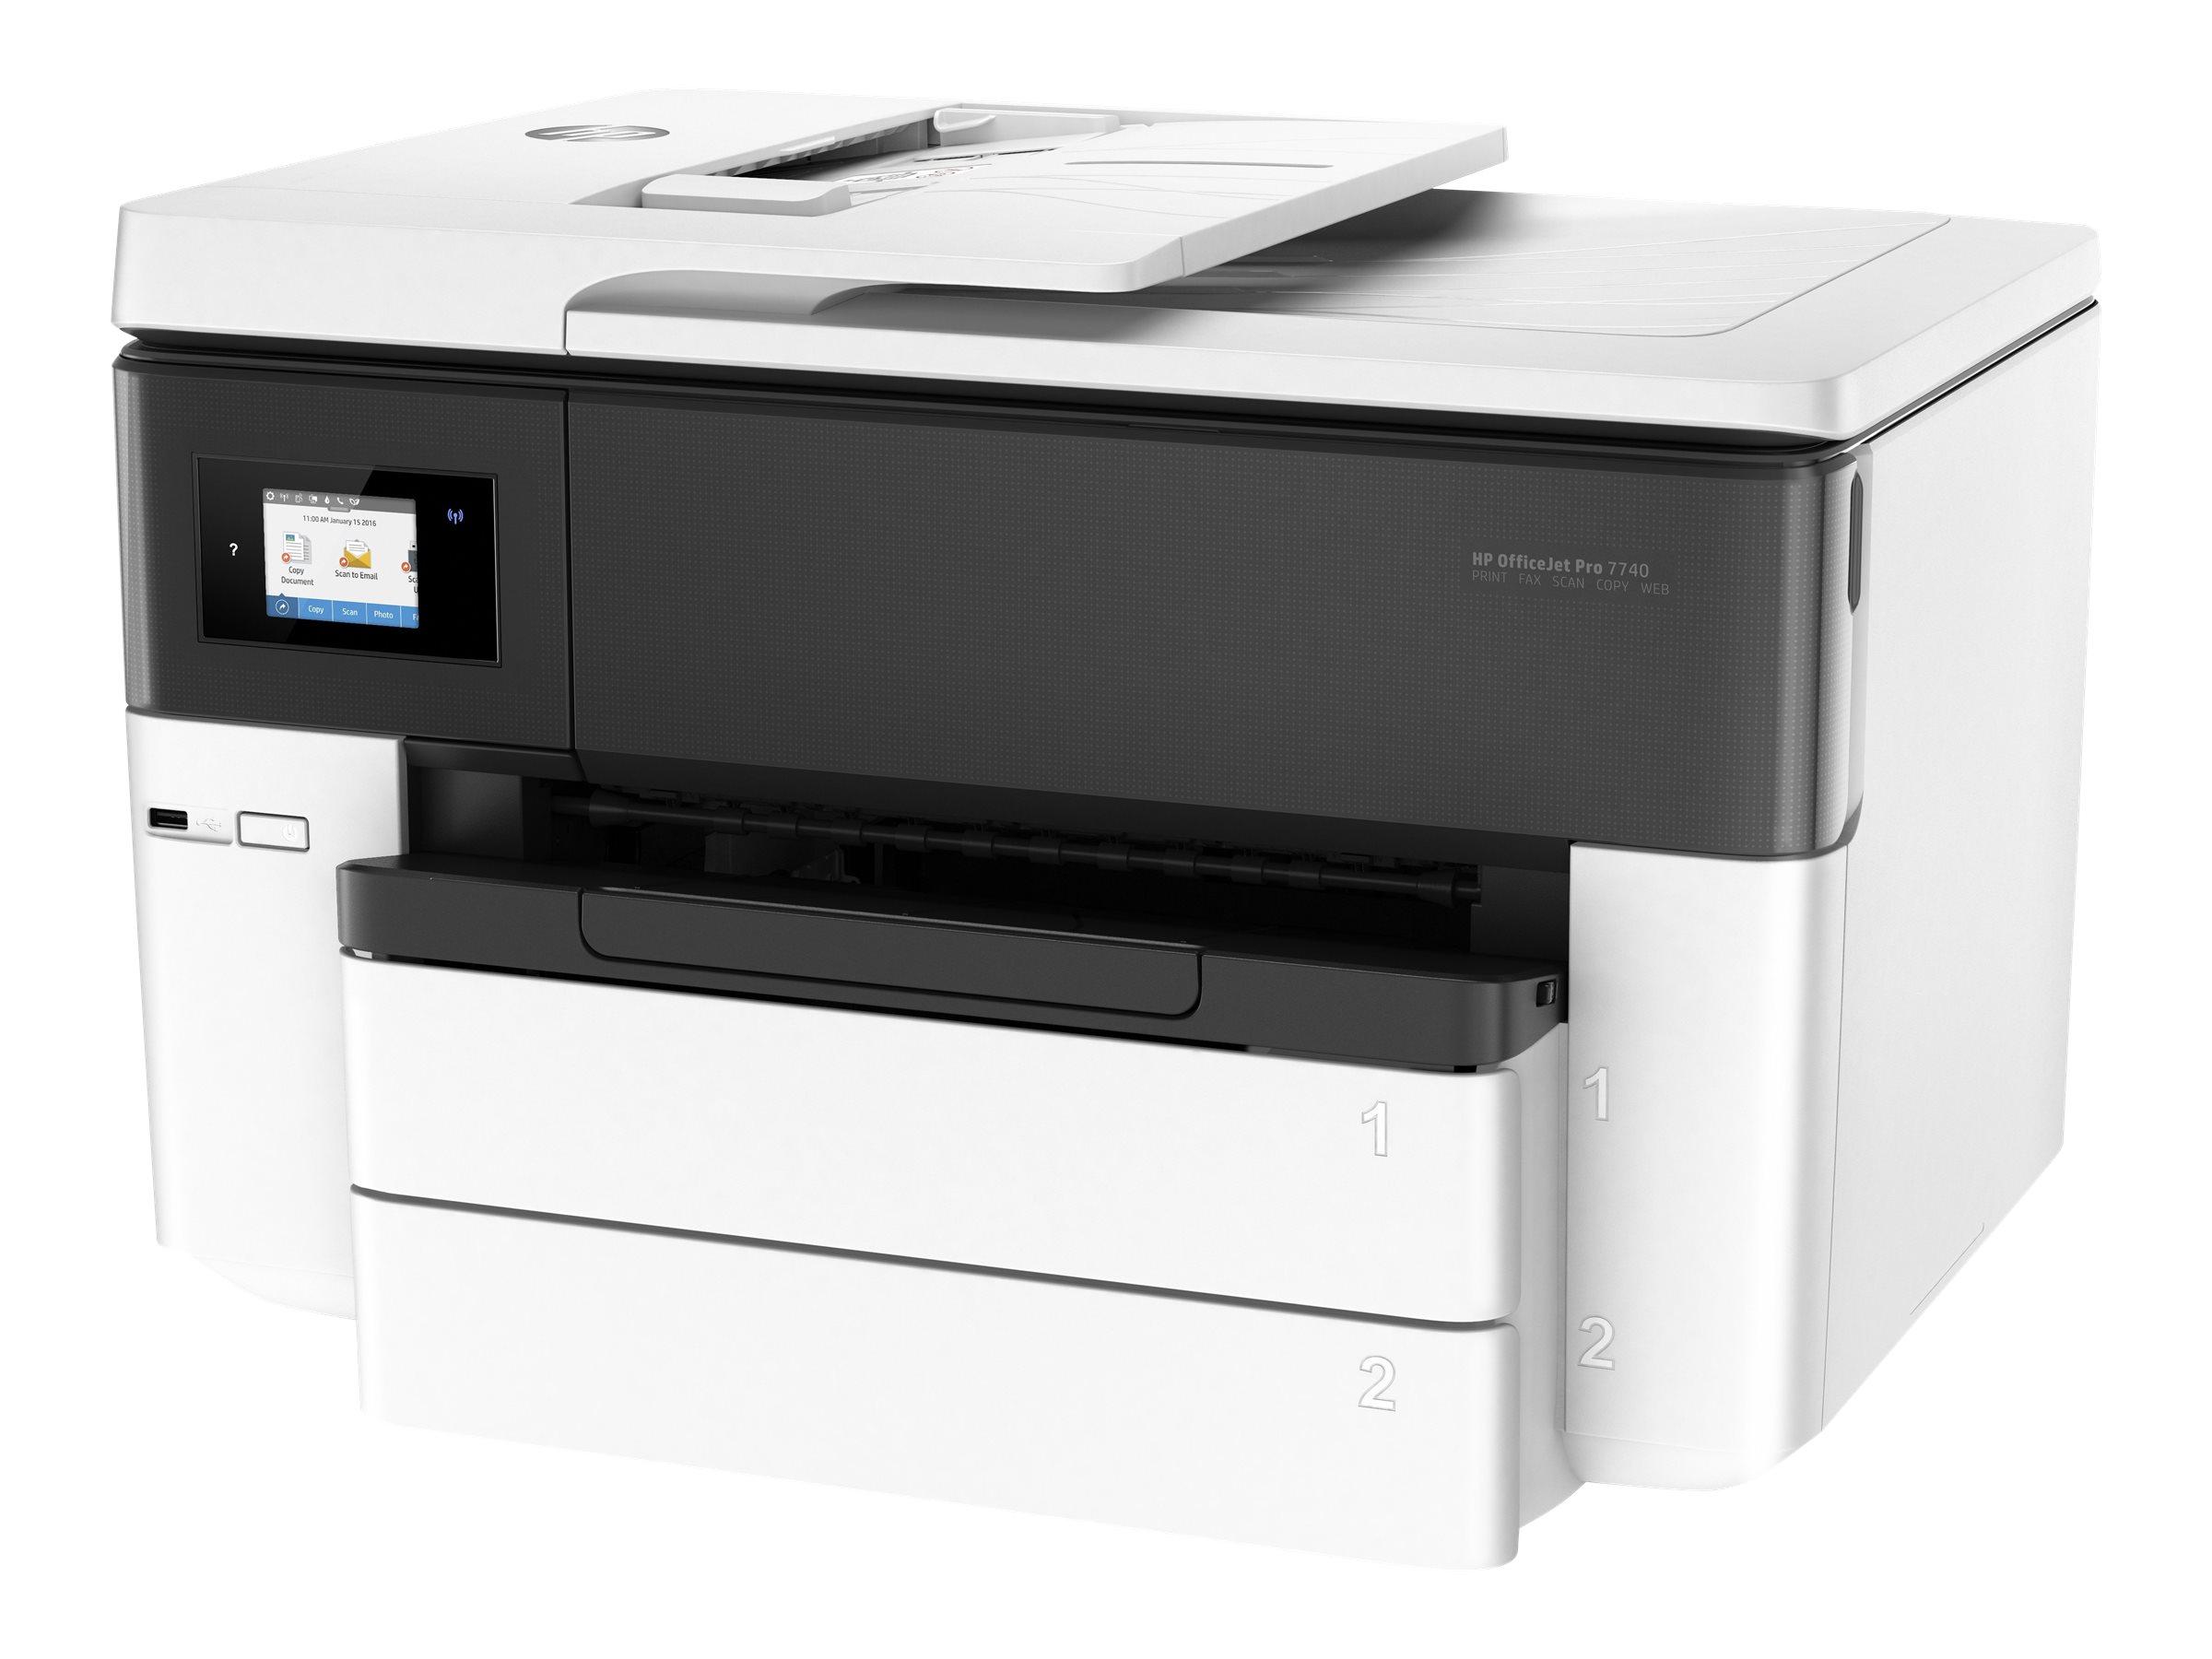 HP Officejet Pro 7740 All-in-One - Multifunktionsdrucker - Farbe - Tintenstrahl - A3/Ledger (297 x 432 mm) (Original) - A3 (Medi